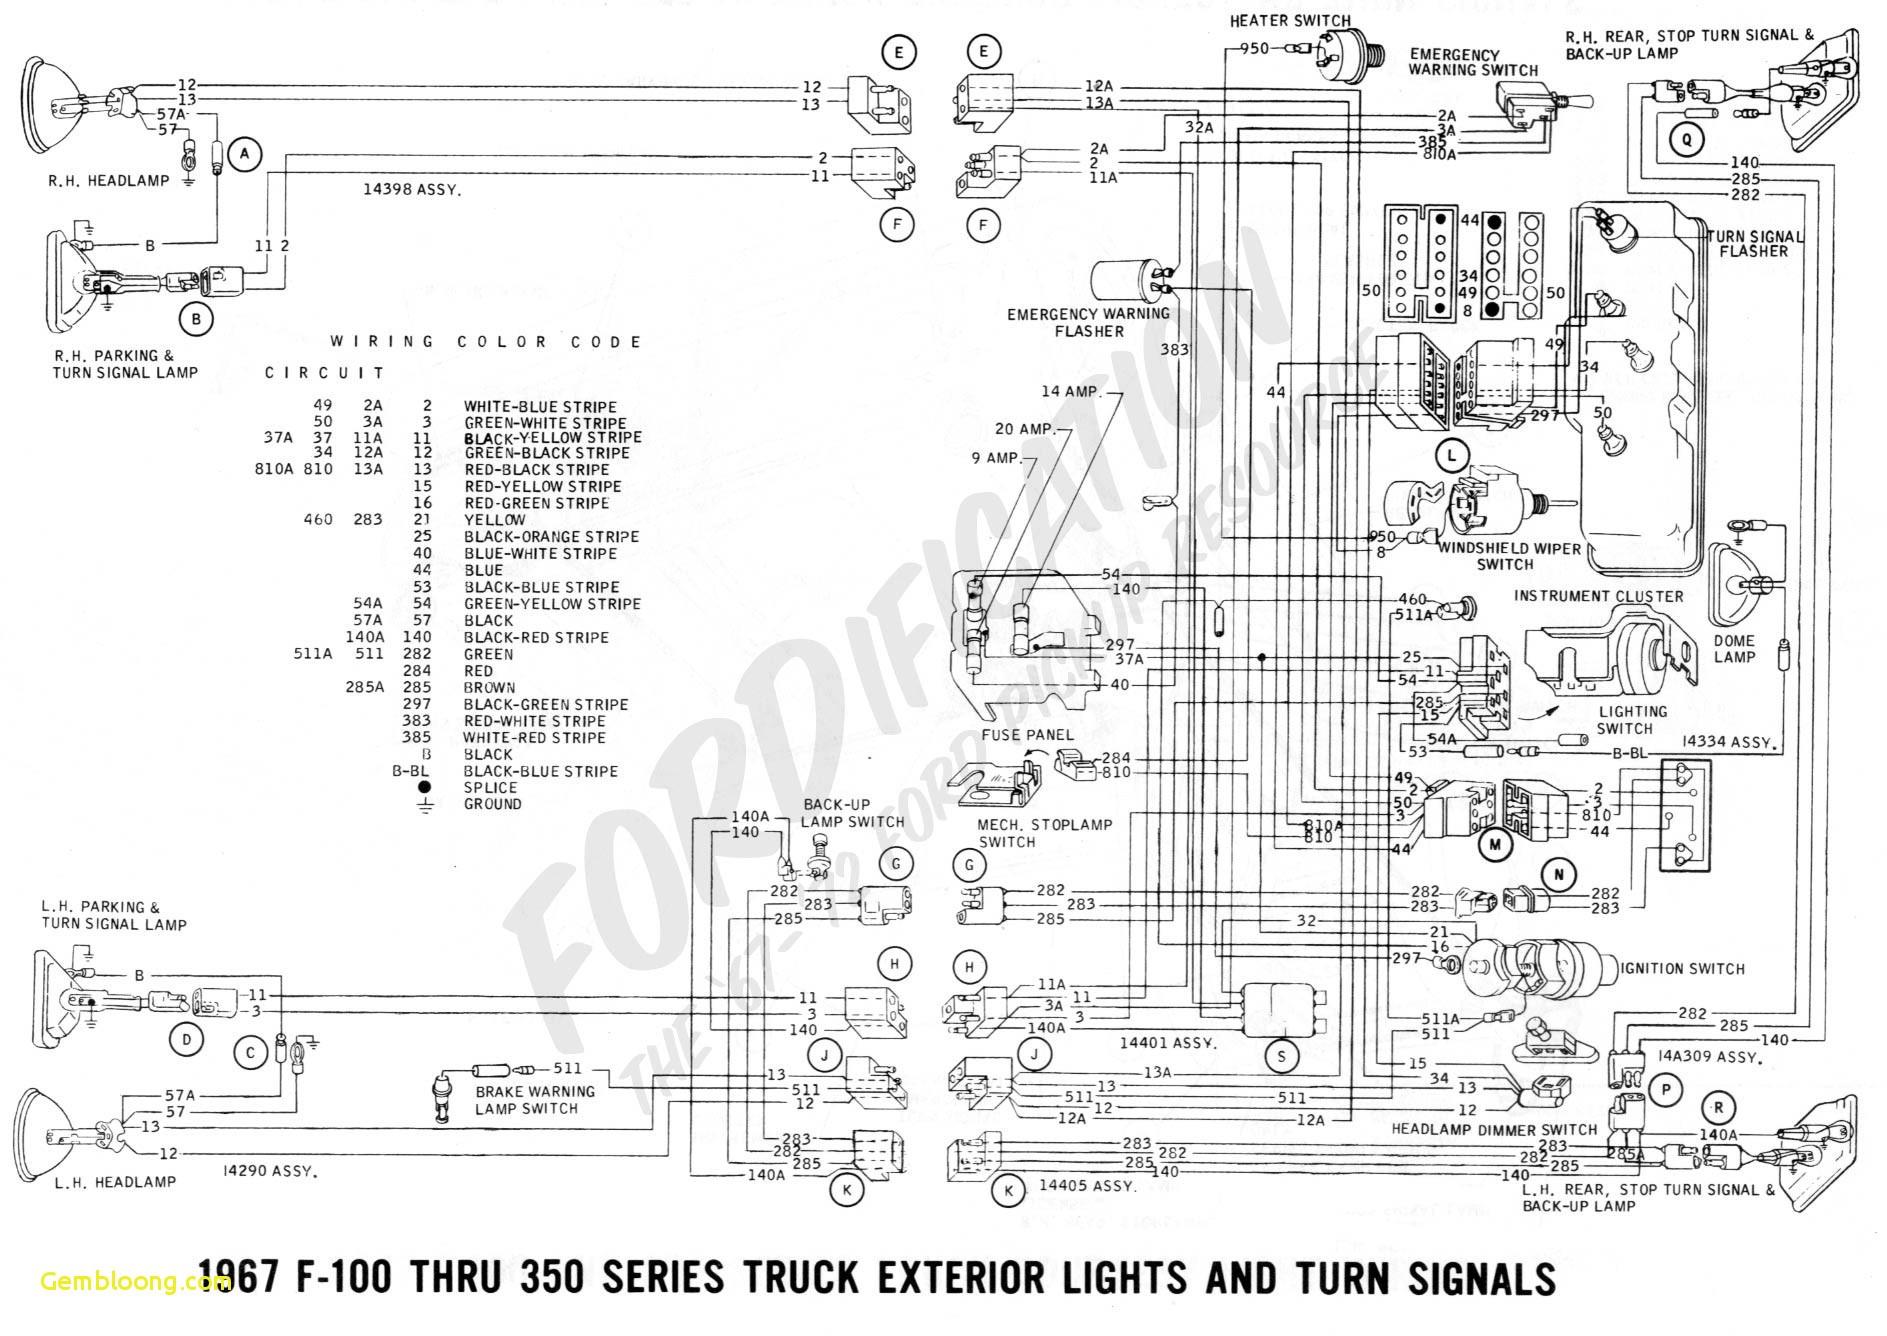 Ford F150 Engine Diagram Download ford Trucks Wiring Diagrams ford F150 Wiring Diagrams Best Of Ford F150 Engine Diagram